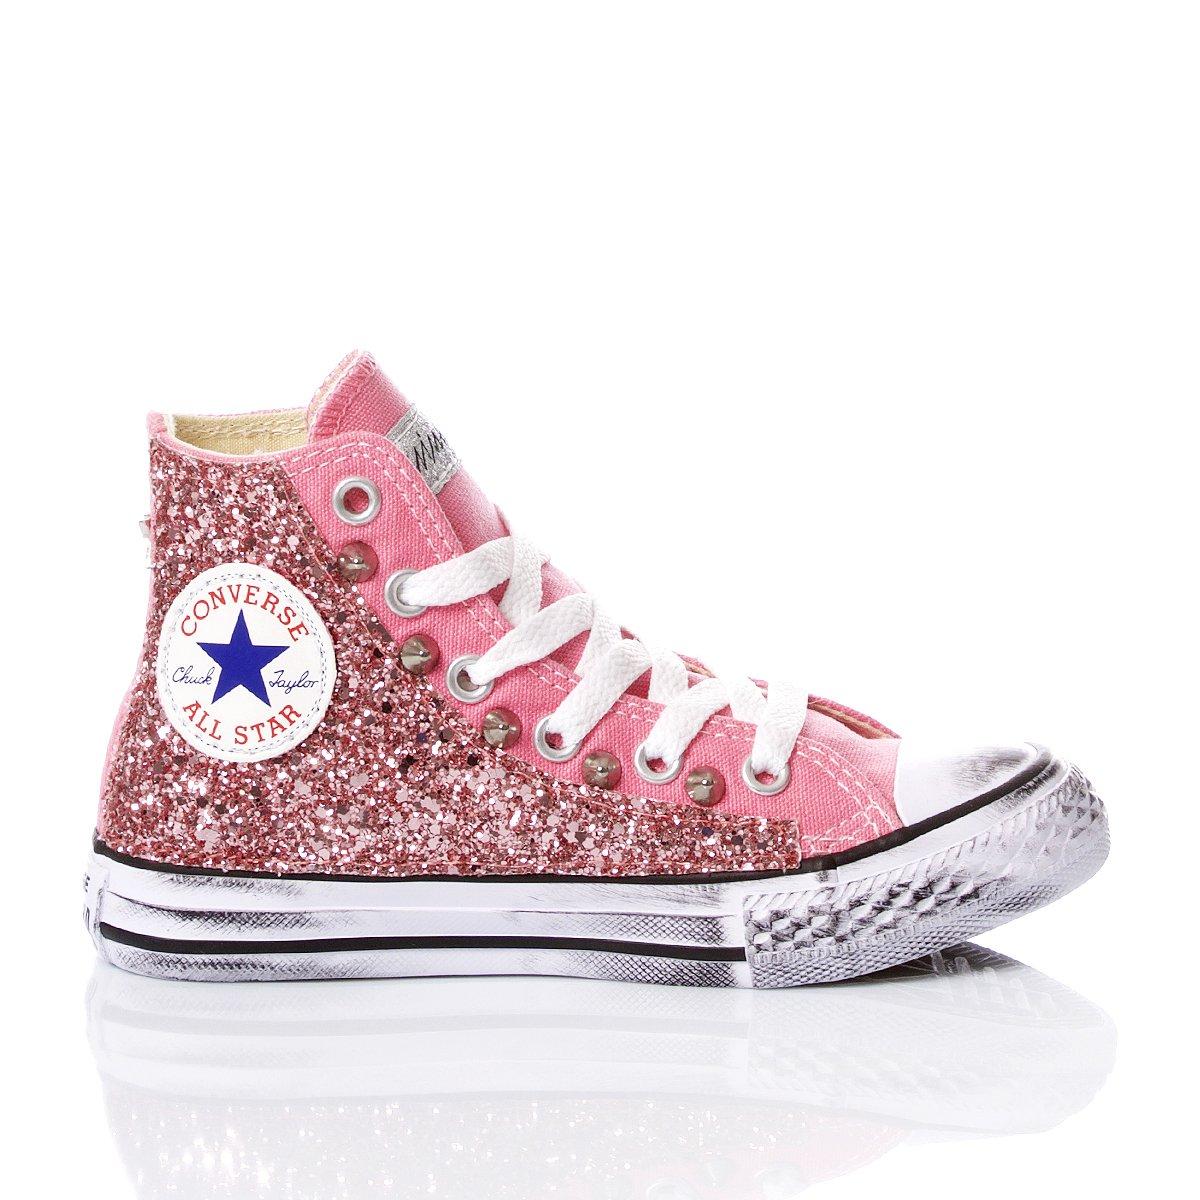 Converse Junior Glitter Pink